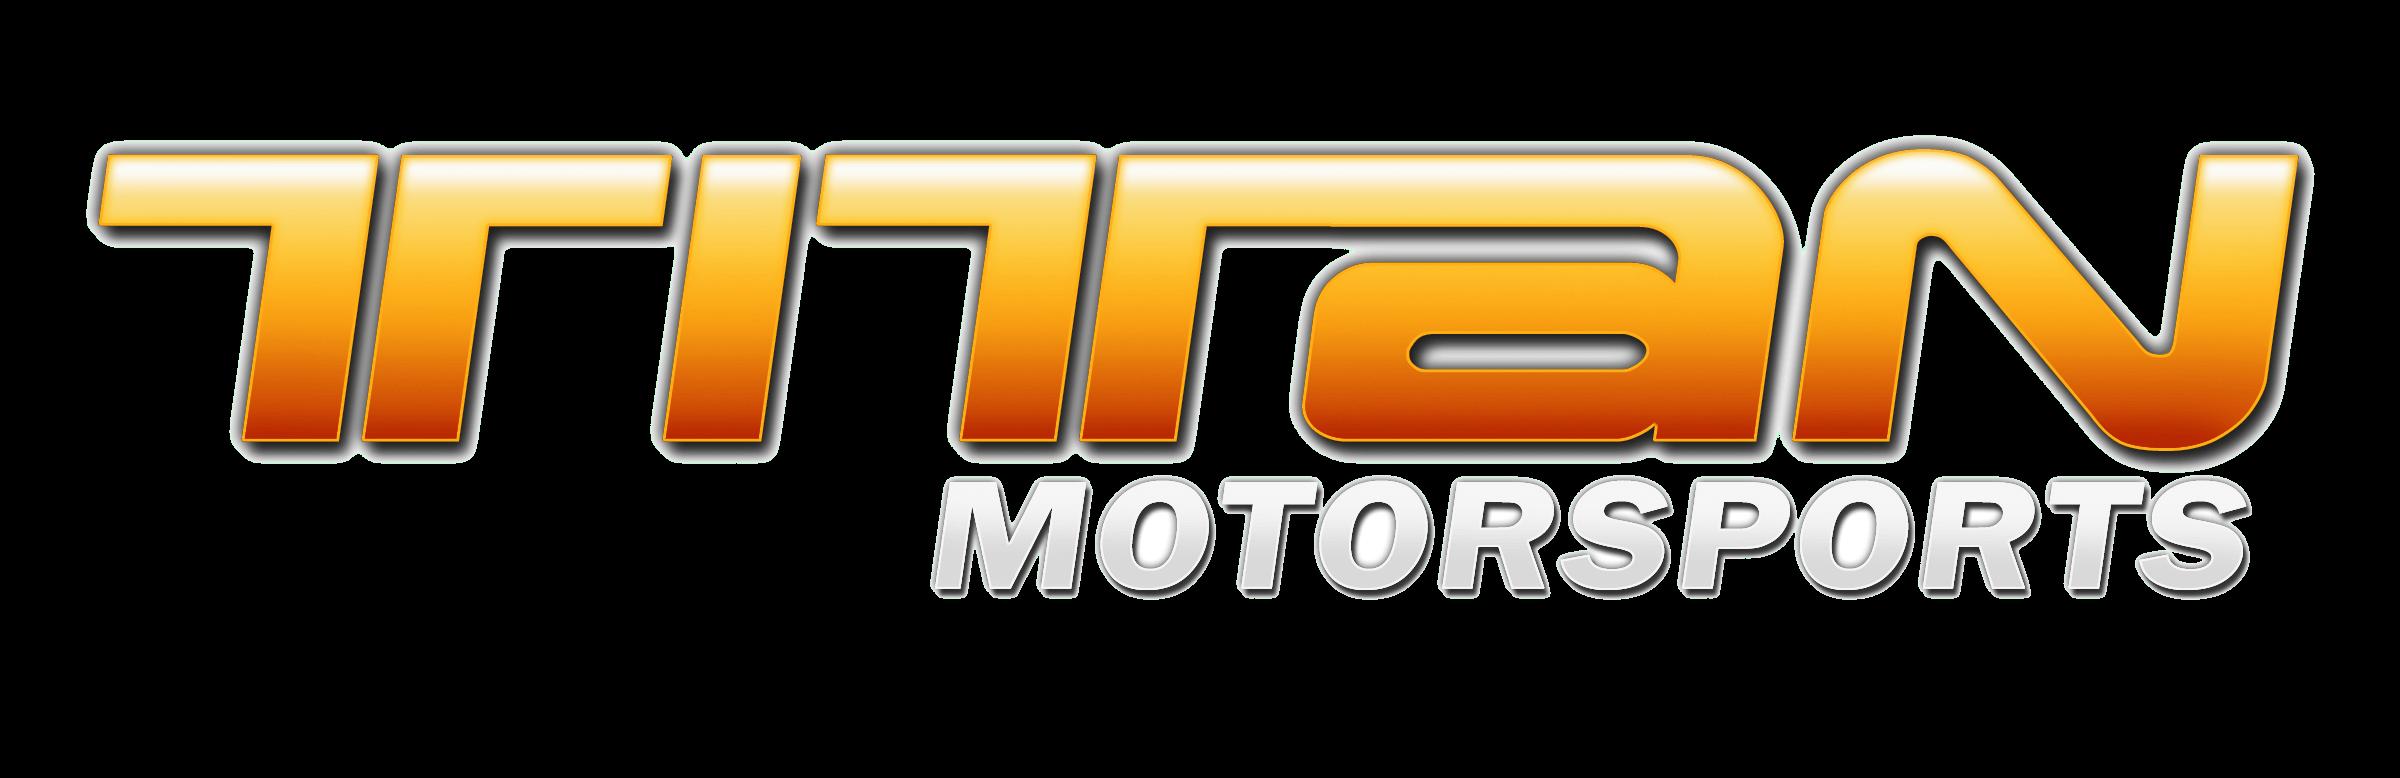 Titan Motorsport case study